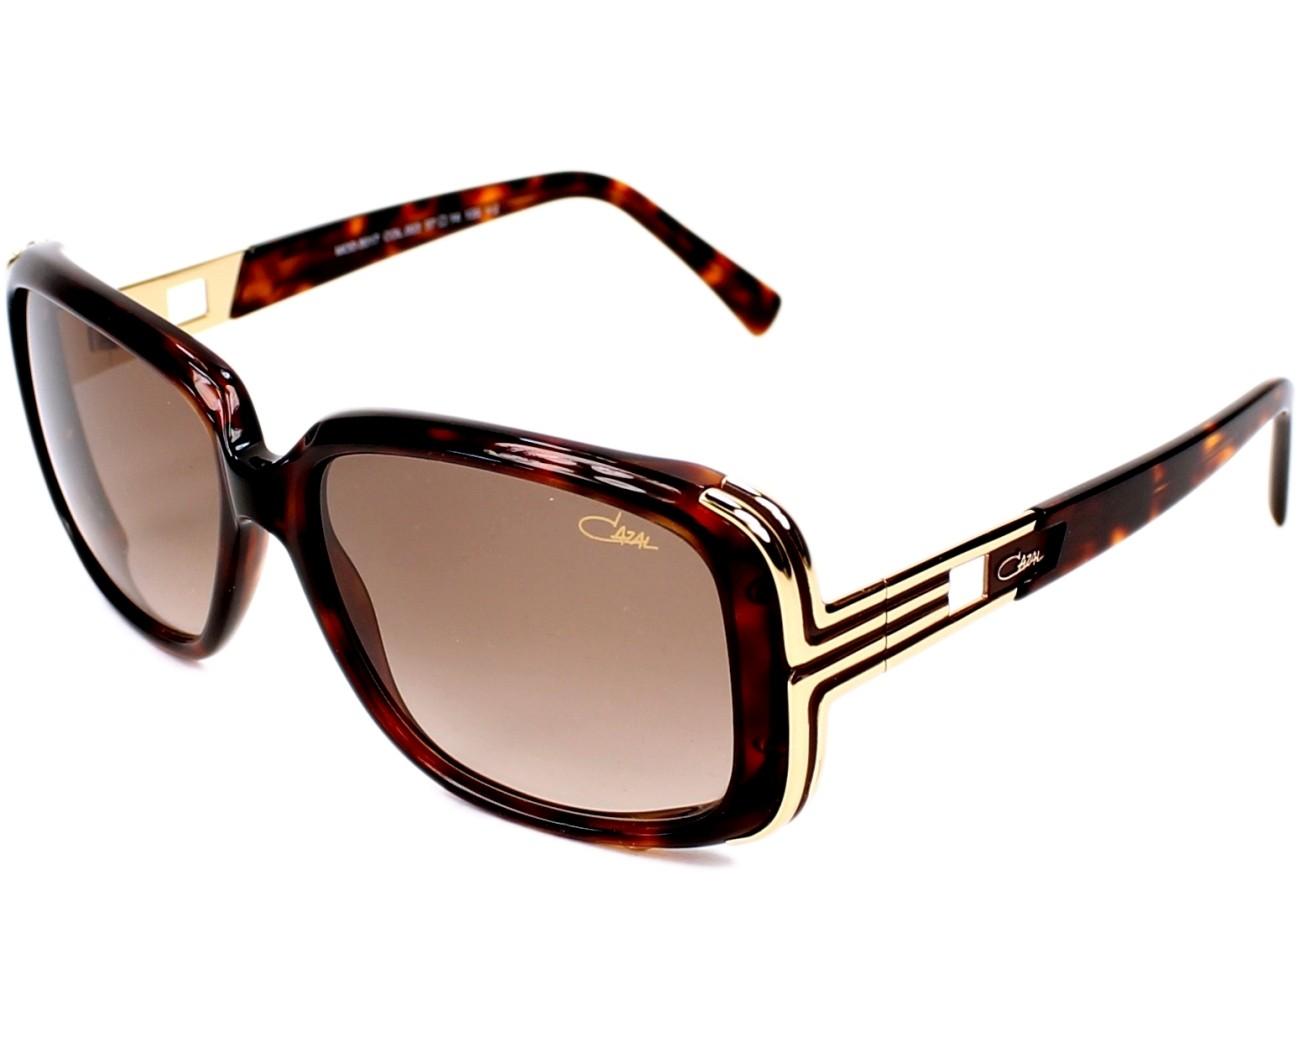 e9a647432542 Cazal Women s Sunglasses